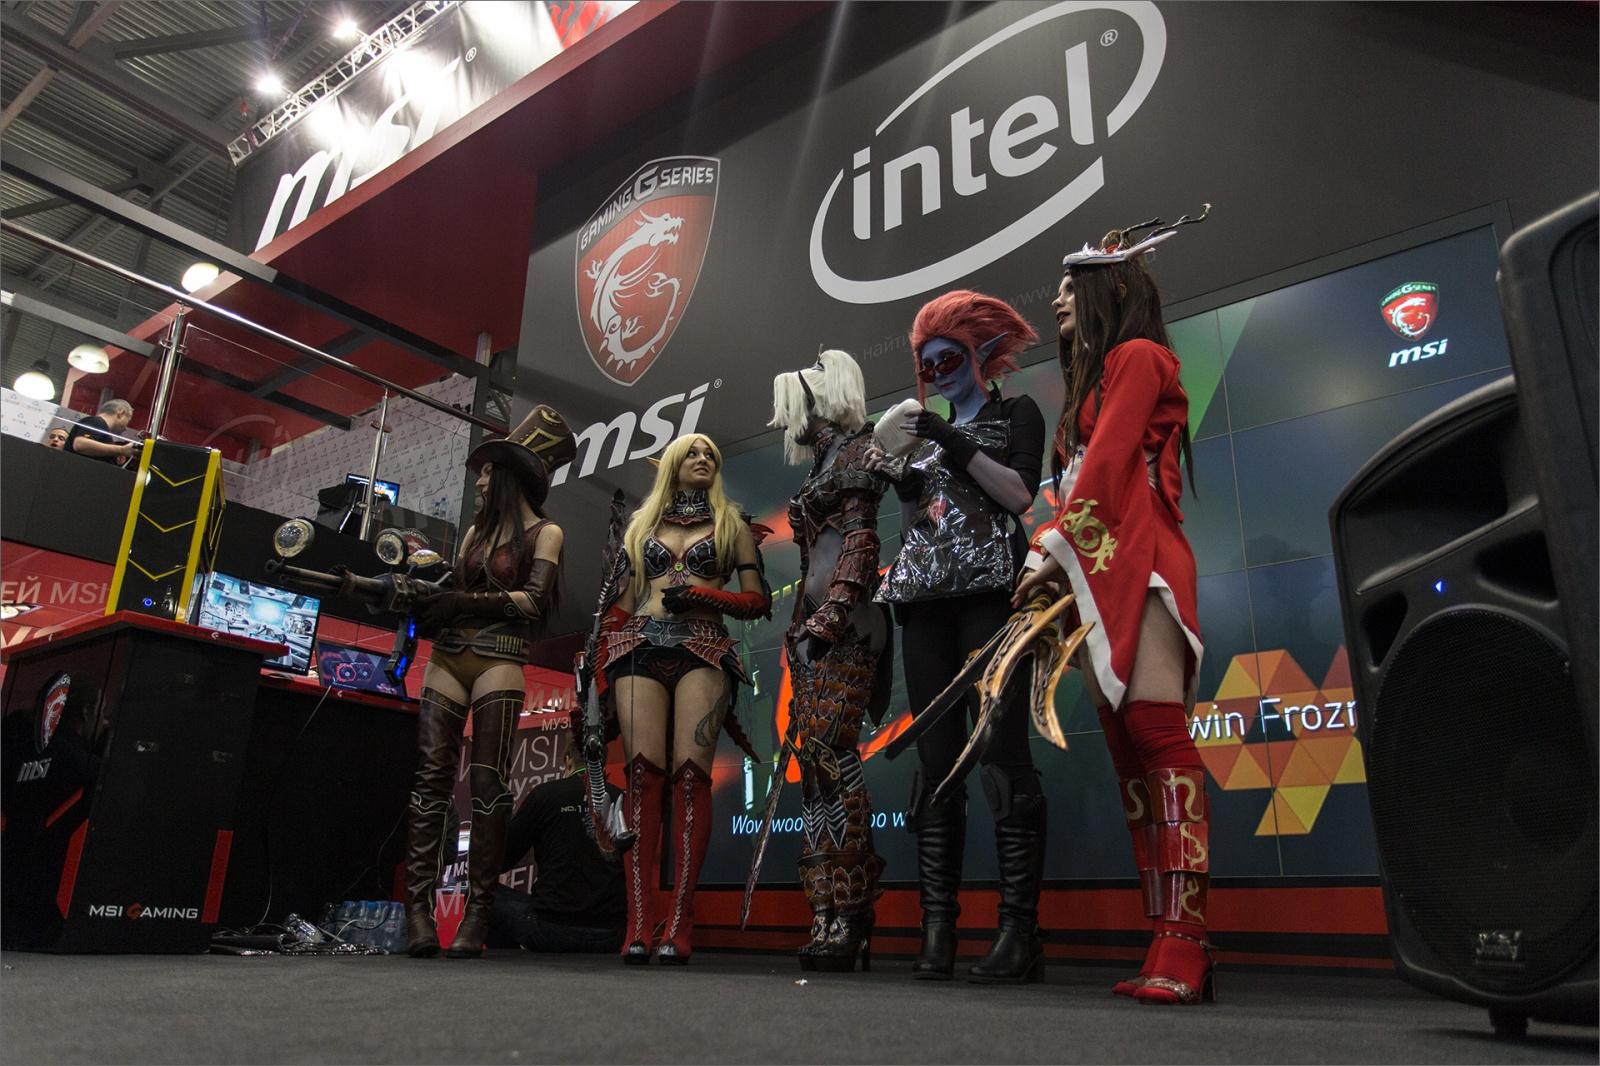 Intel значит побеждать: захват игромира прошёл успешно - 11